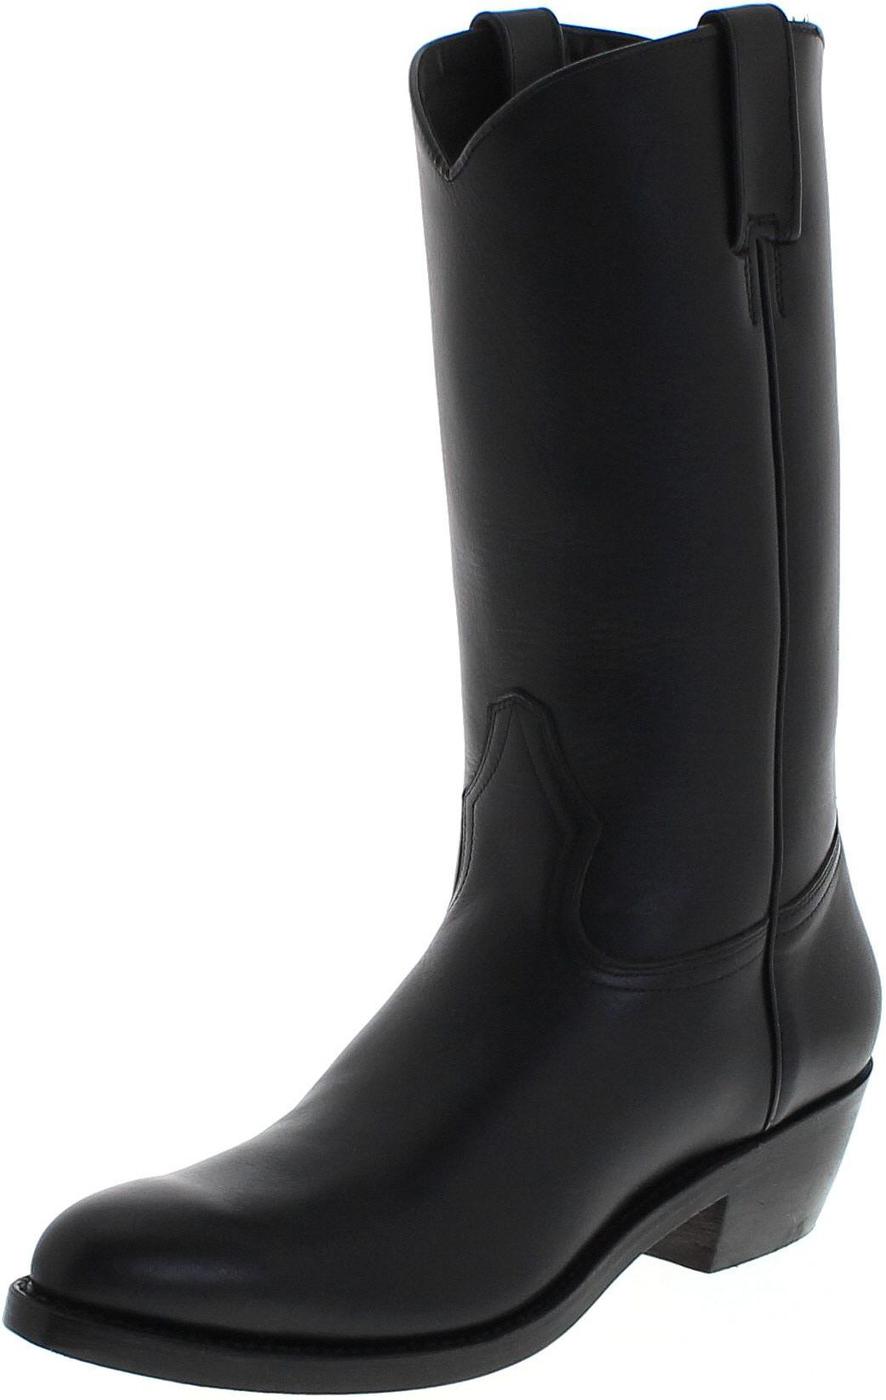 Fashion Boots 650 Black Classic Boots - Black